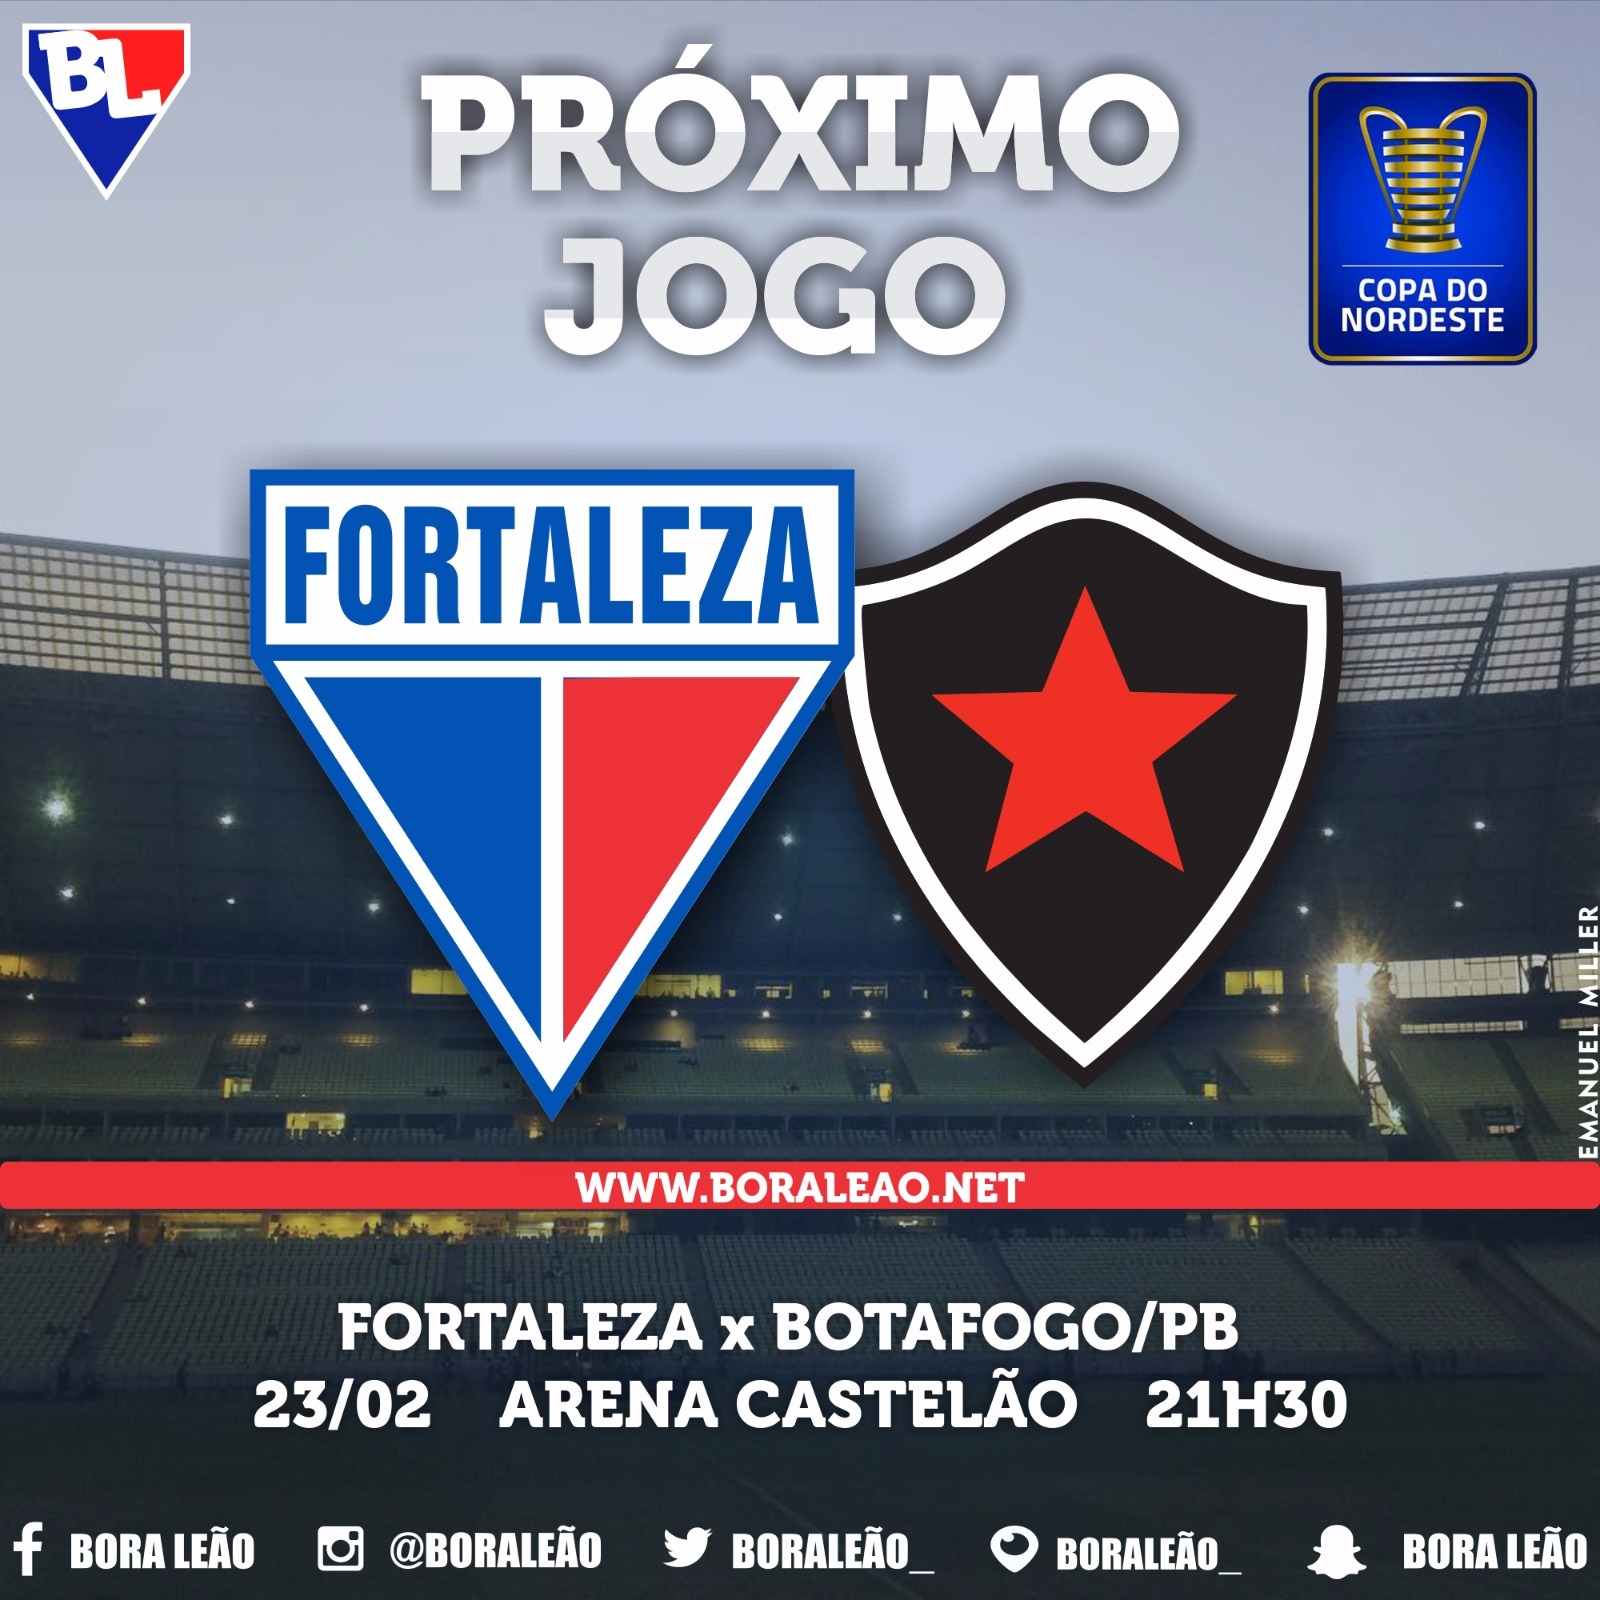 Pre Jogo Fortaleza X Botafogo Pb Bora Leao